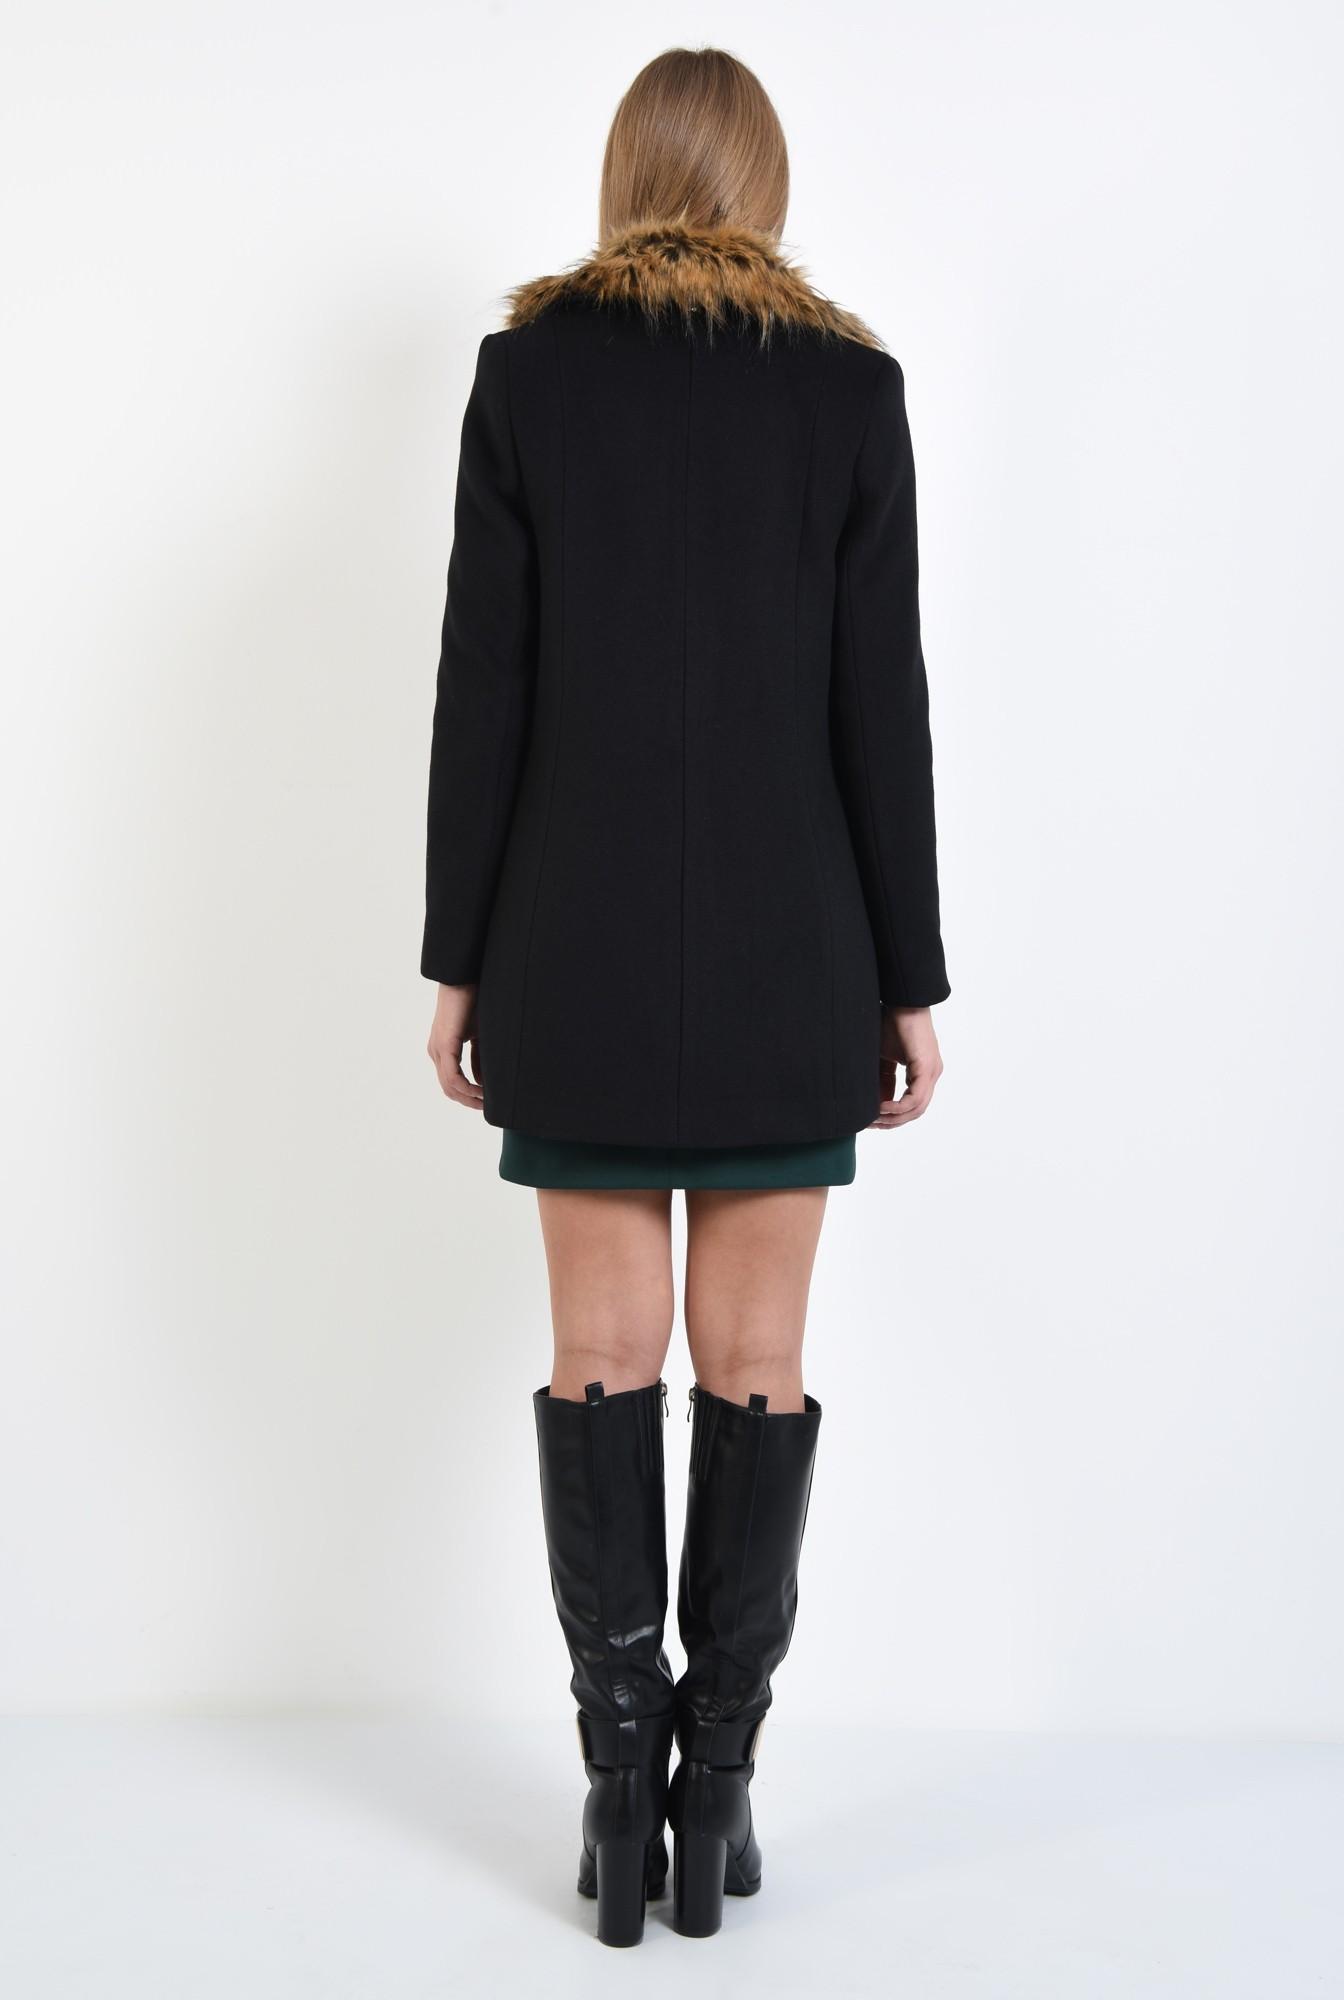 1 - 360 - palton negru, croi drept, nasturi, guler detasabil